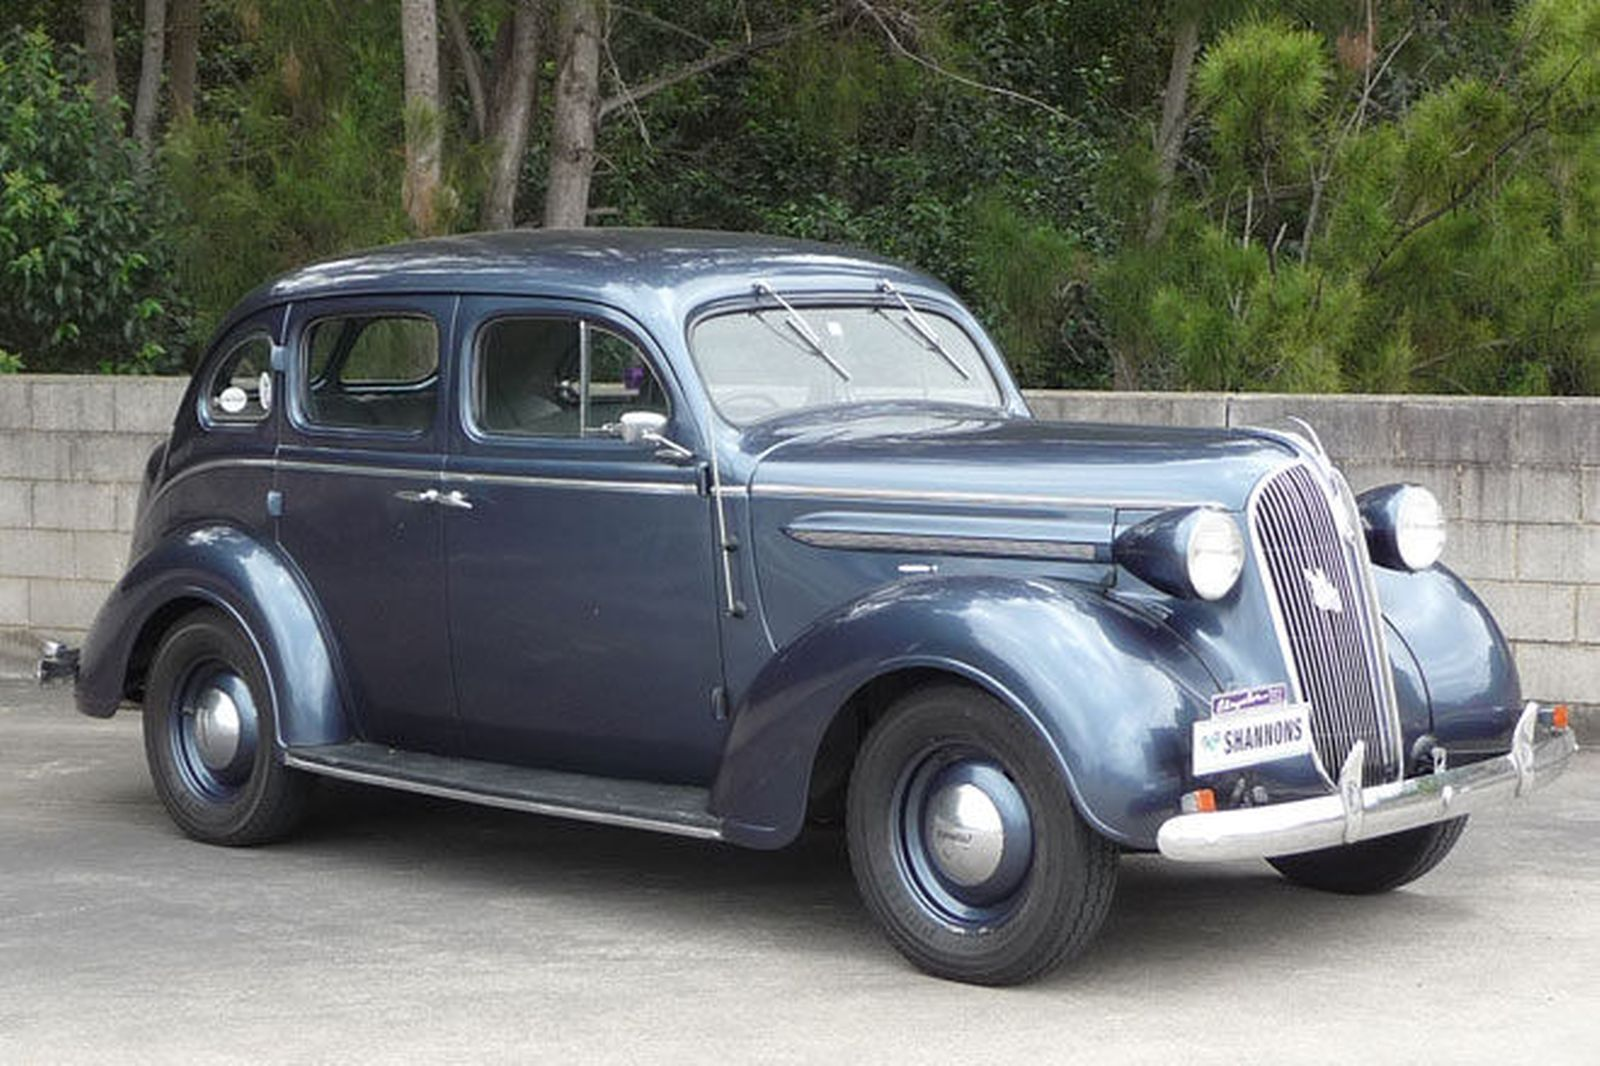 The Chrysler PT Cruiser... - Look, it\'s got potential - Not £2 Grand